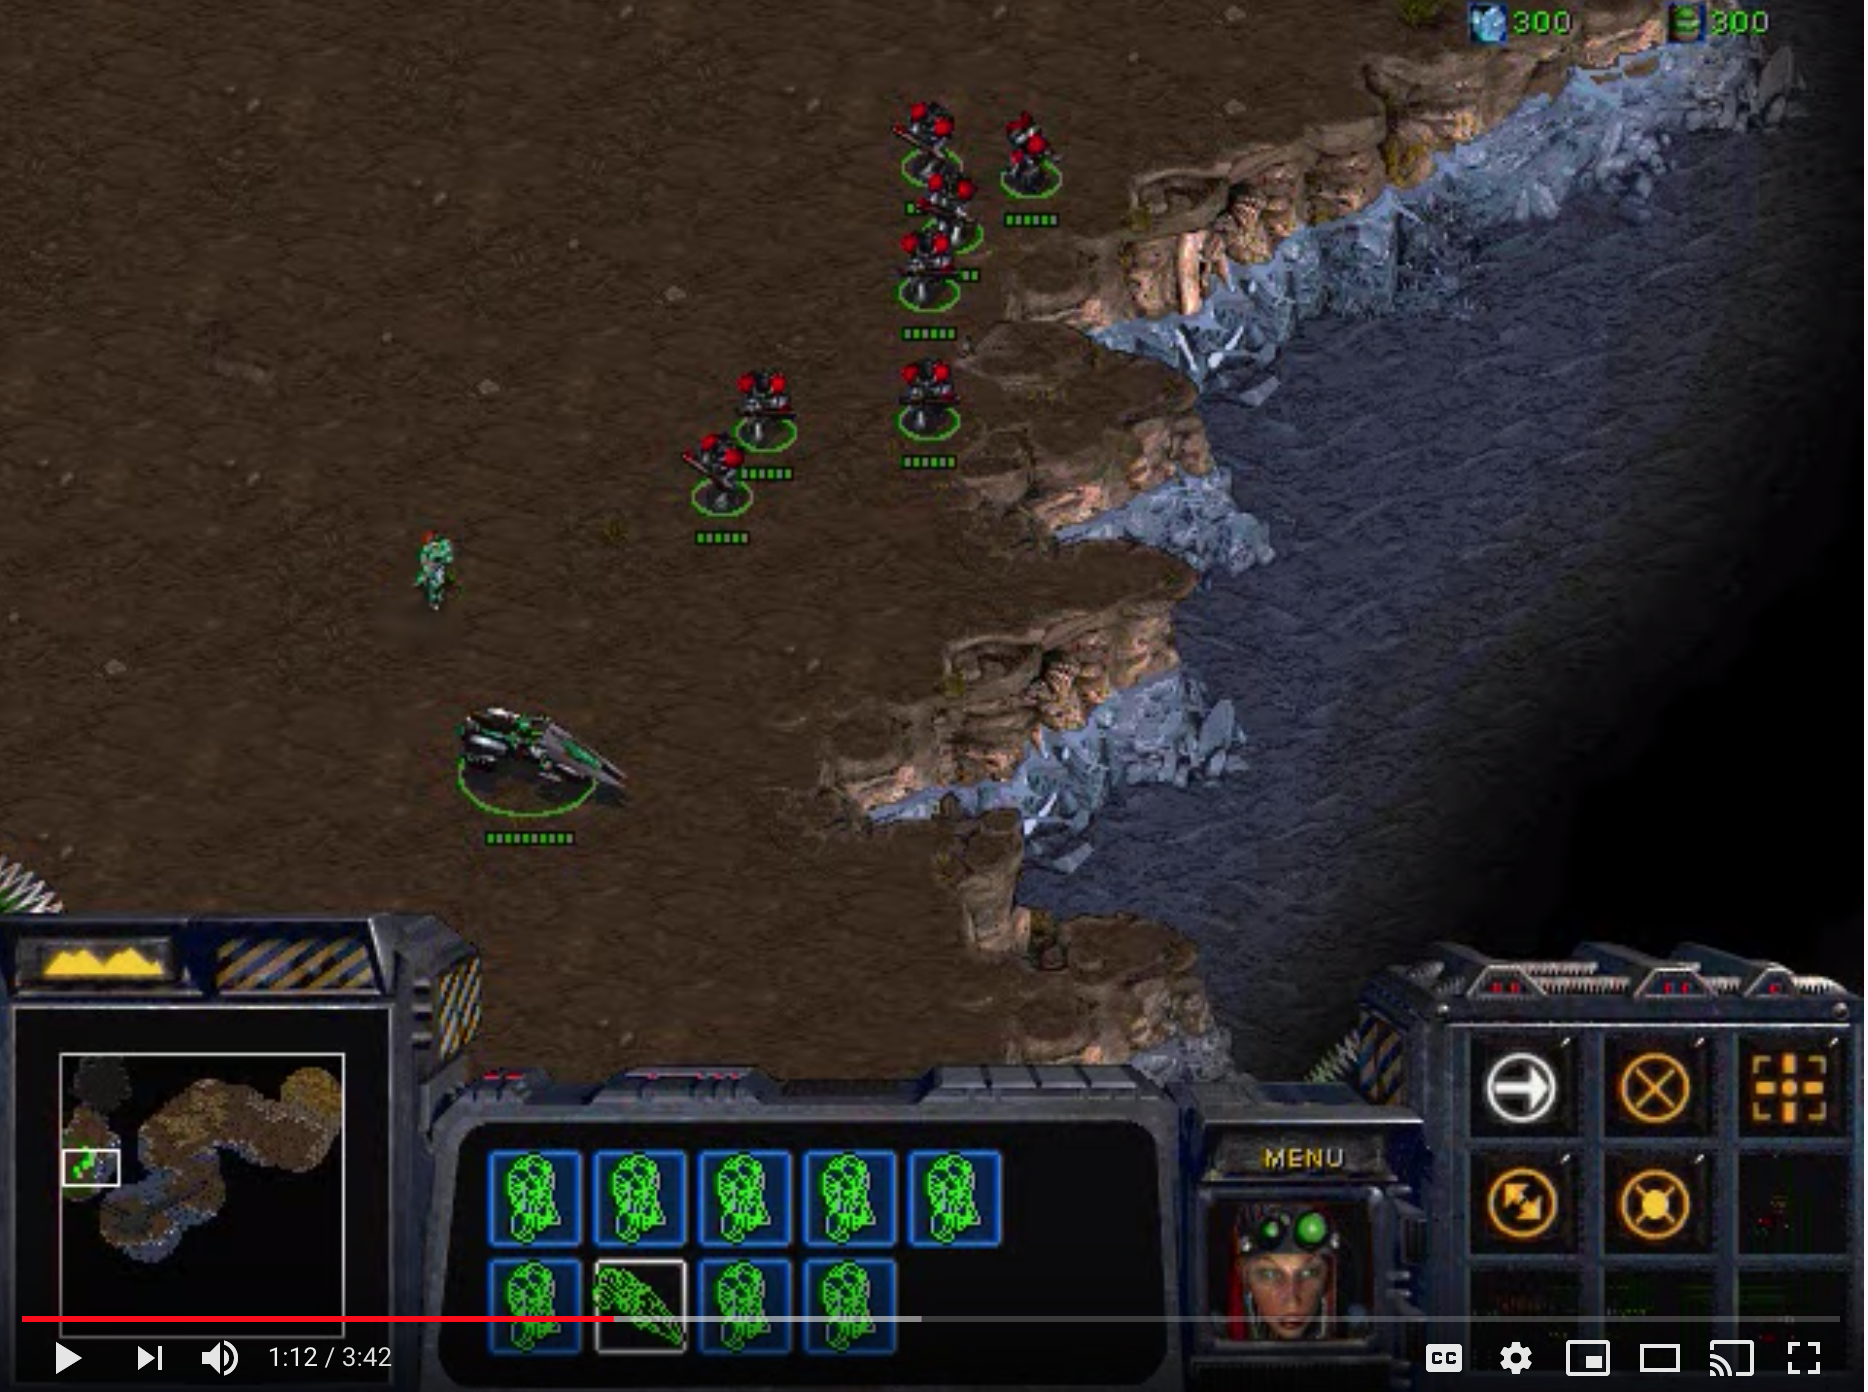 Starcraft - Terran Mission 5: Revolution